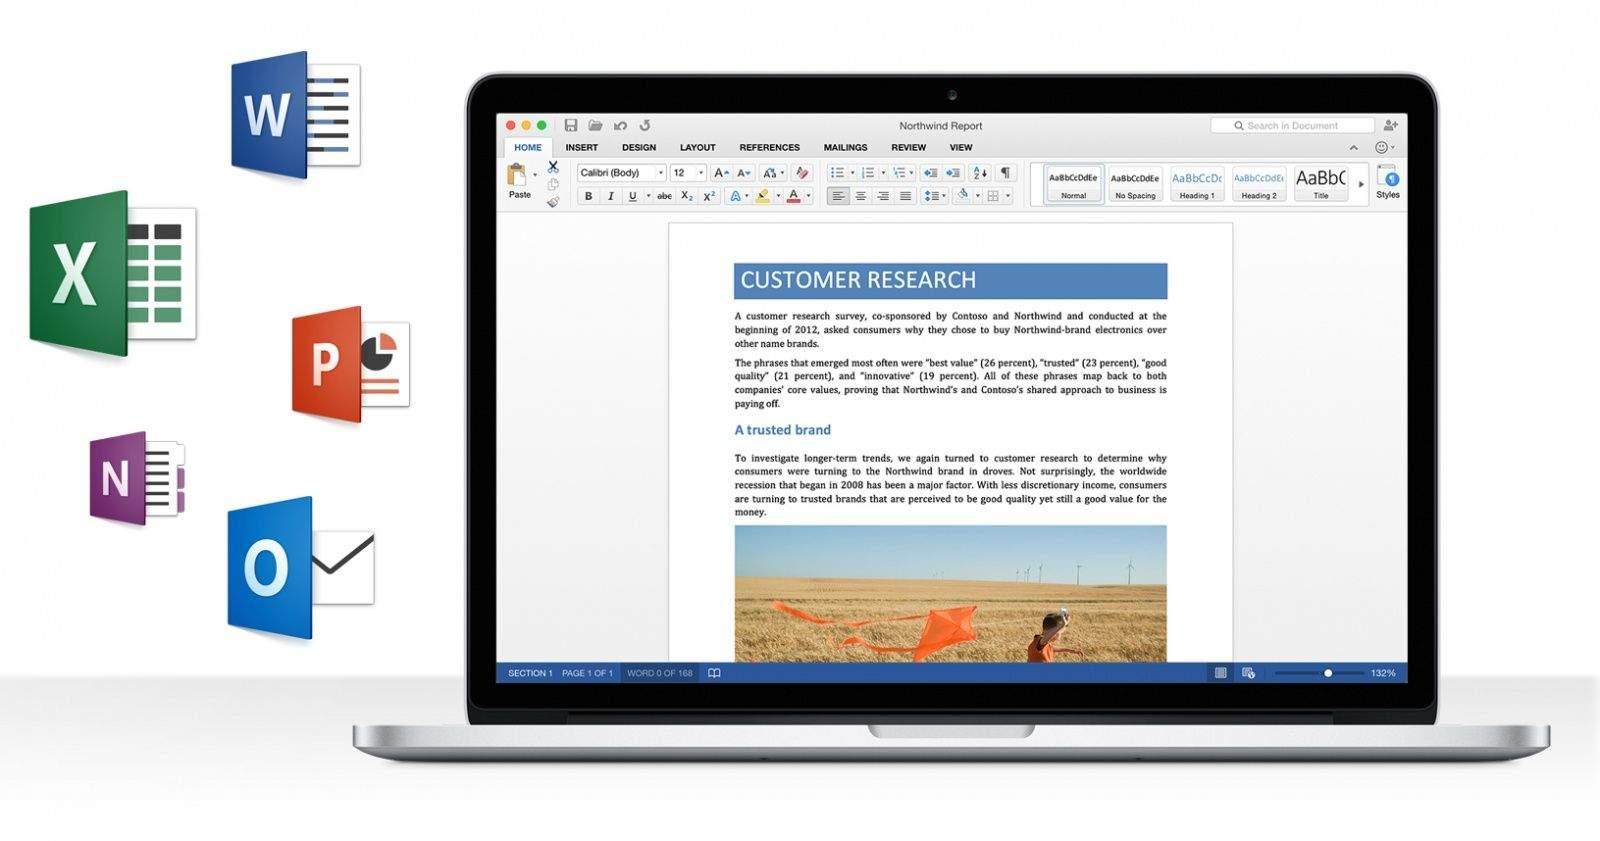 Office 2016 for Mac Retina